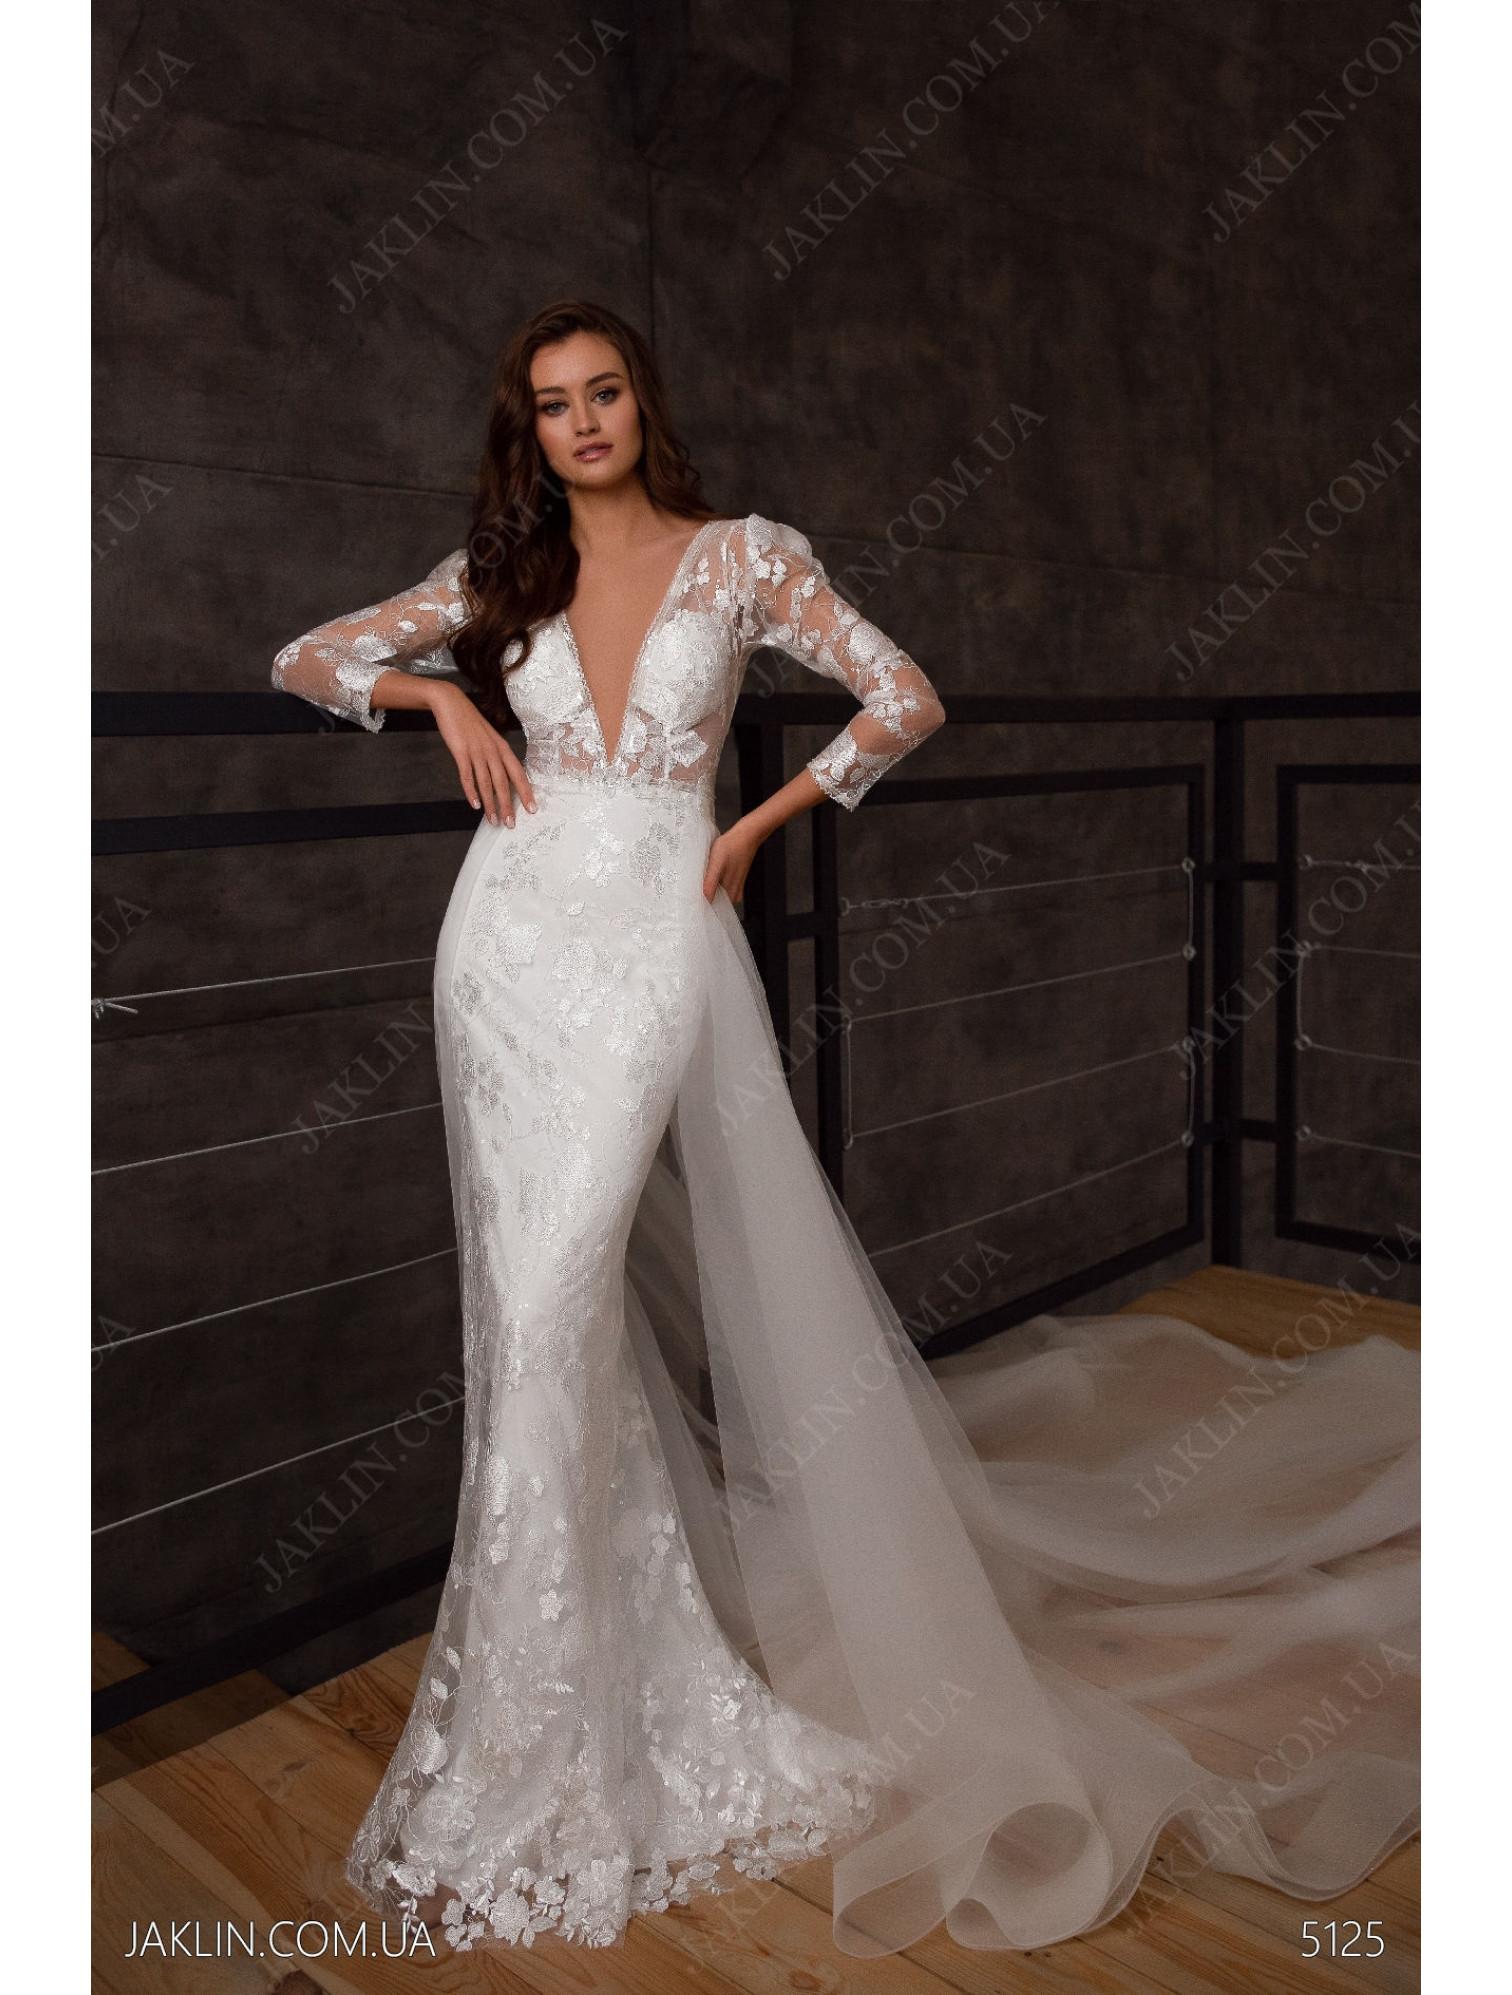 Wedding dress 5125